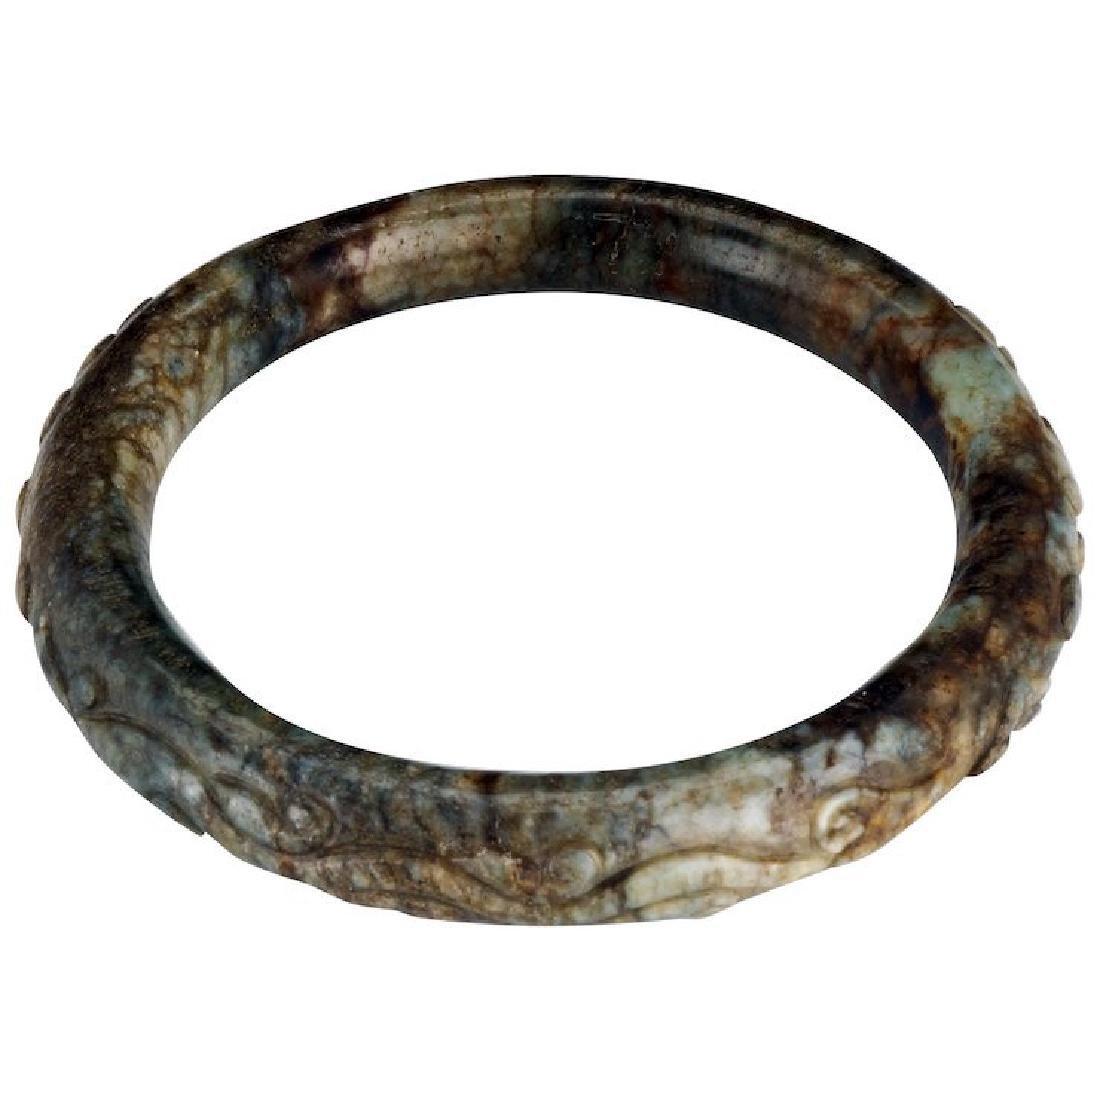 Chinese toroid form 65 mm mottled hardstone bangle